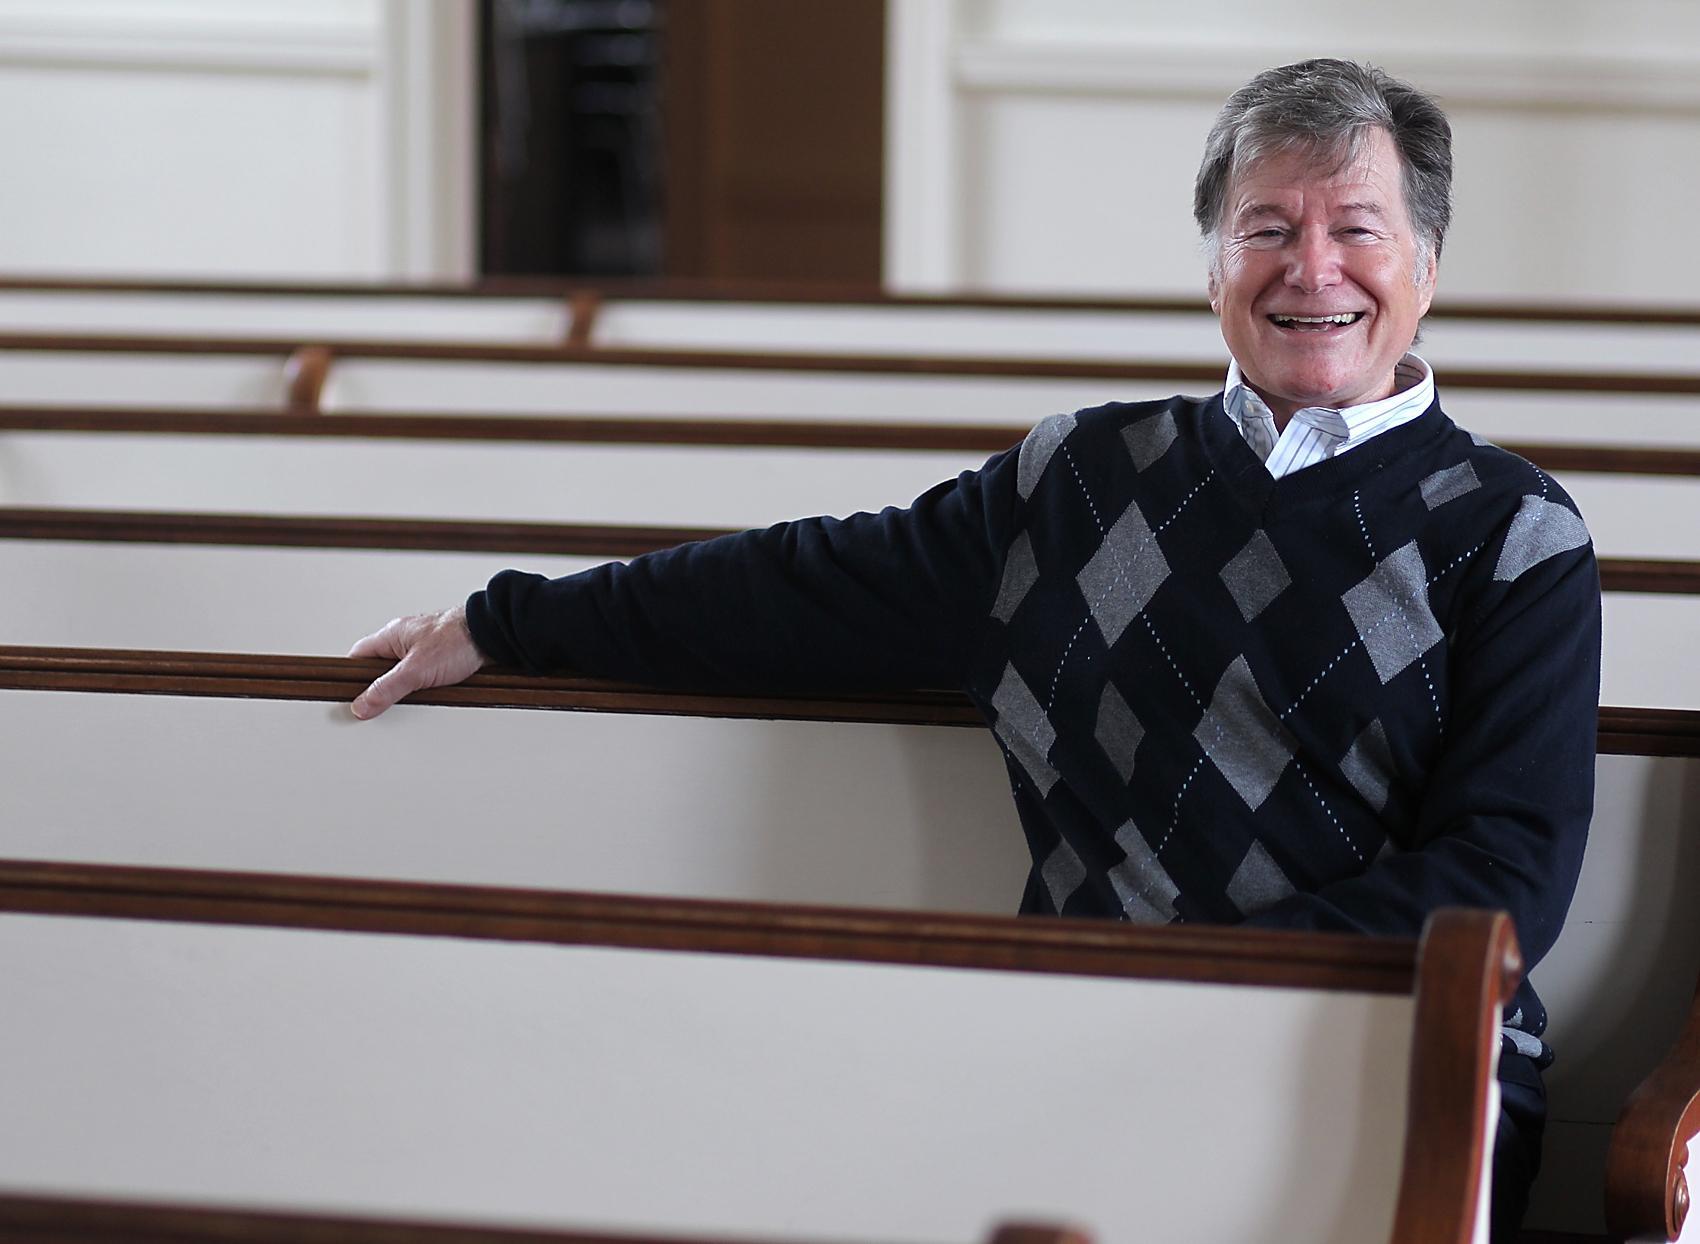 Dr. Rev David Stryker